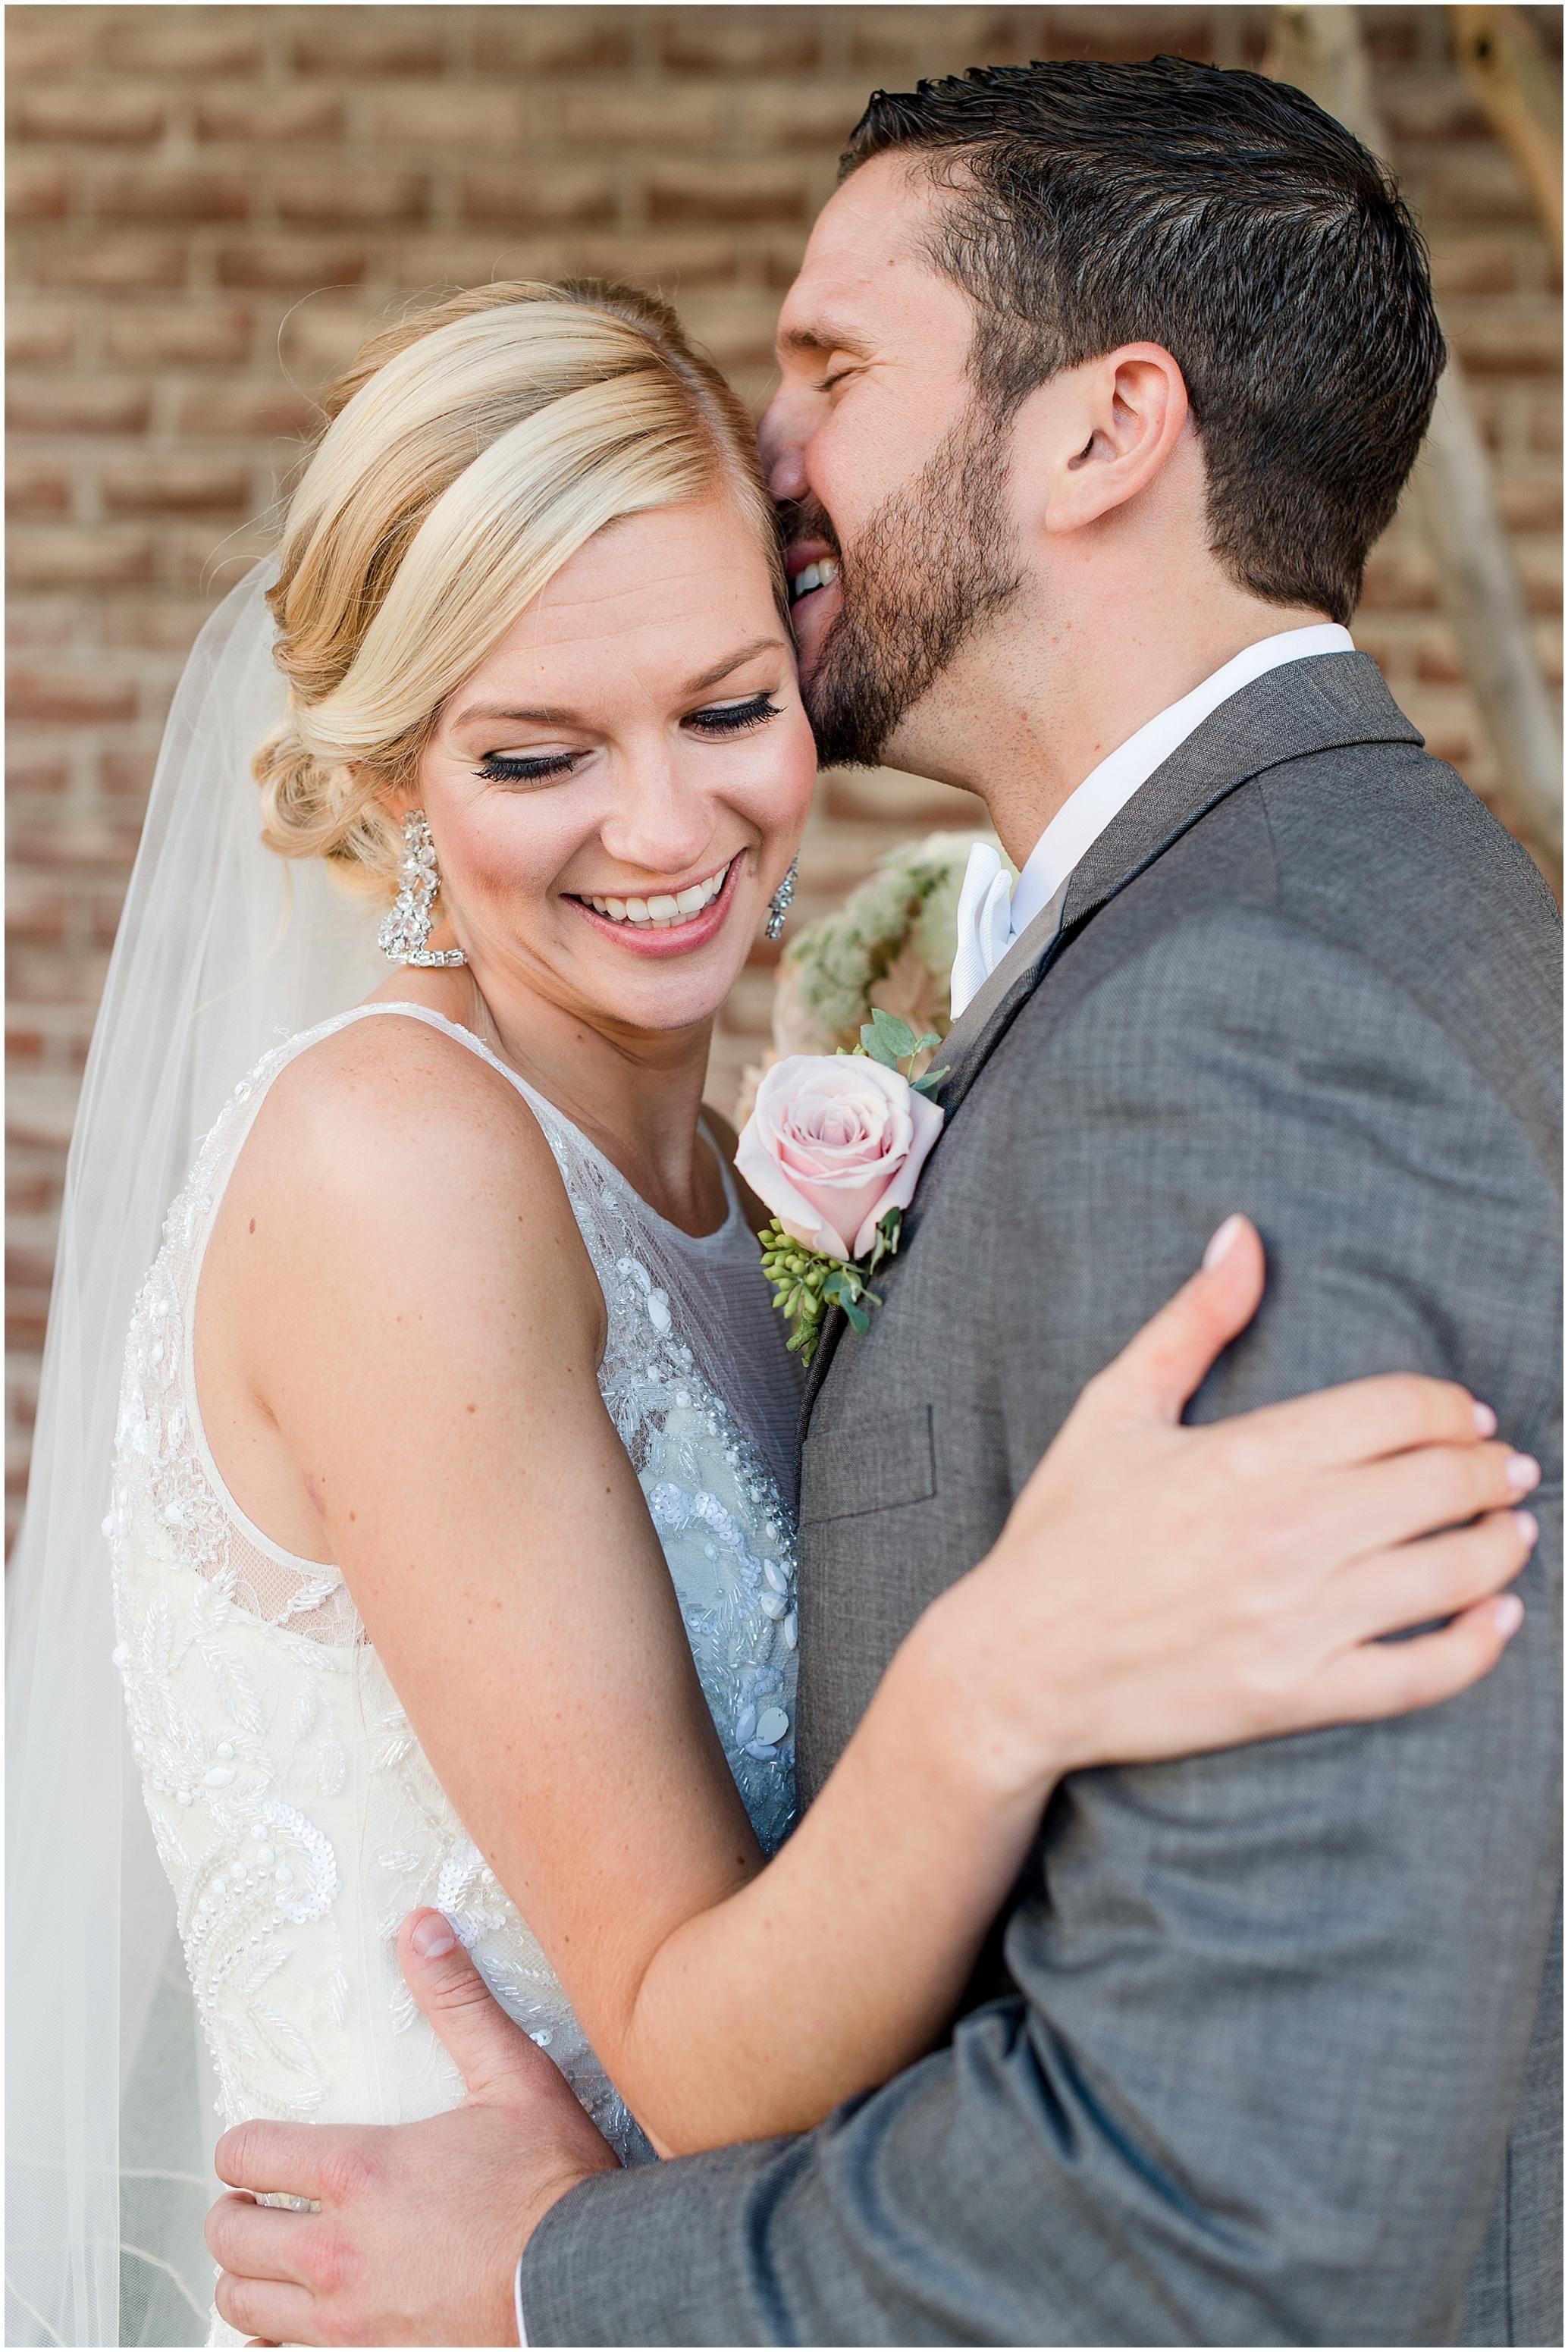 Hannah Leigh Photography Tabrizis Baltimore Wedding_2216.jpg